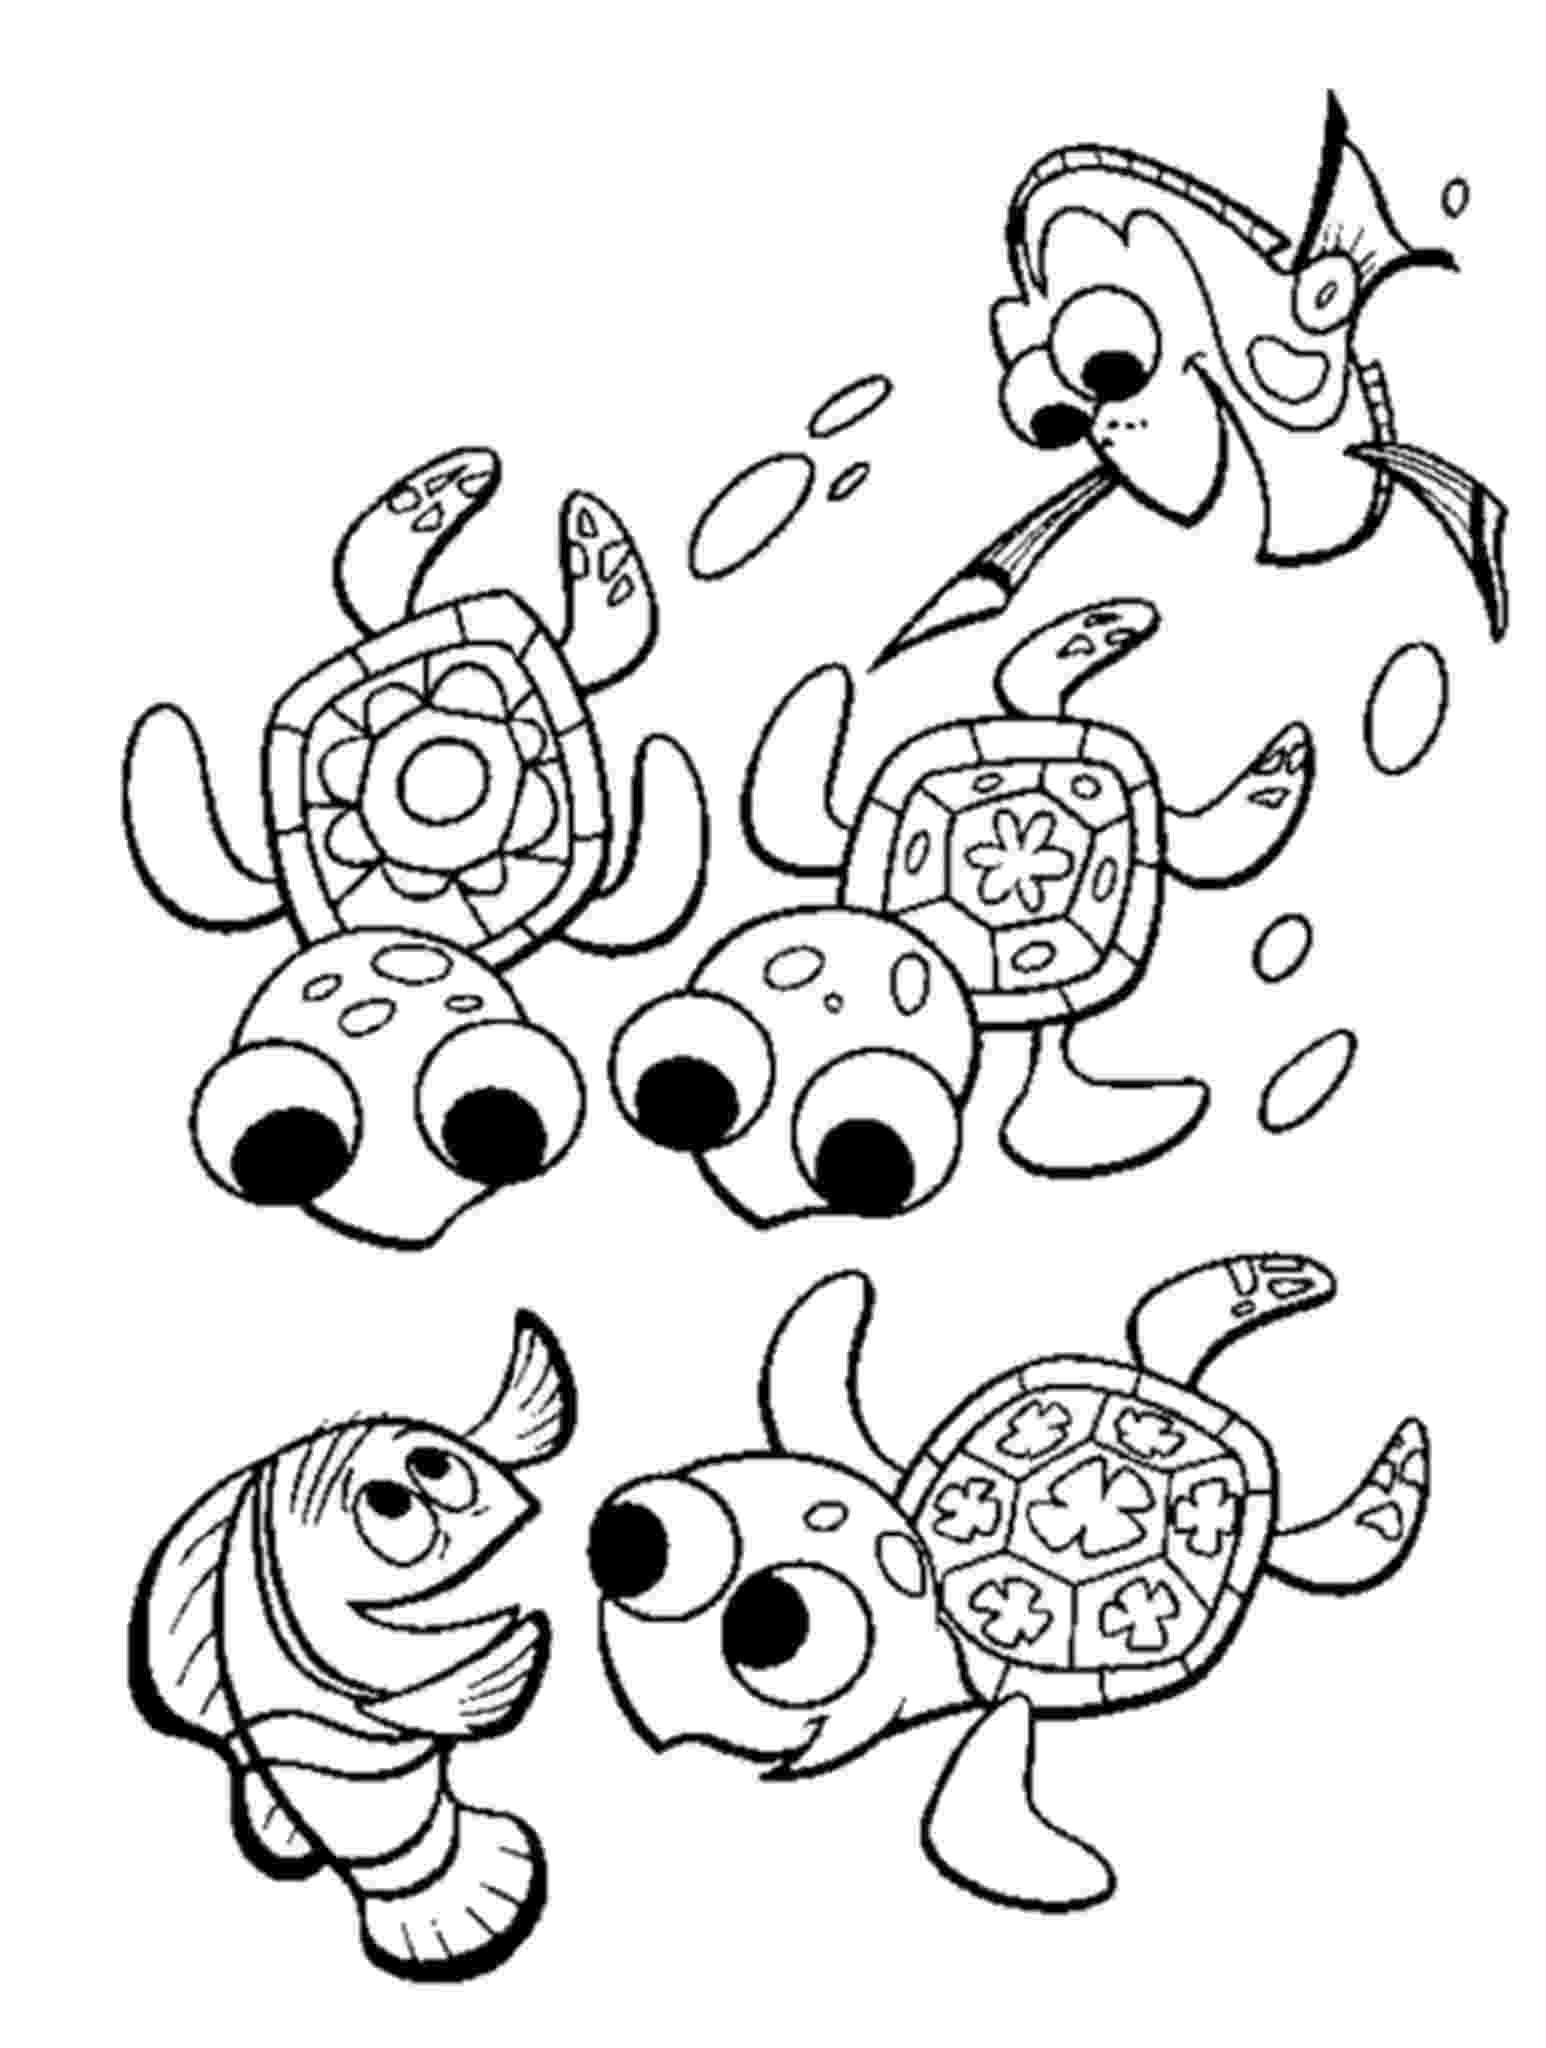 turtle coloring book ninja turtle cartoon coloring pages turtle coloring turtle coloring book